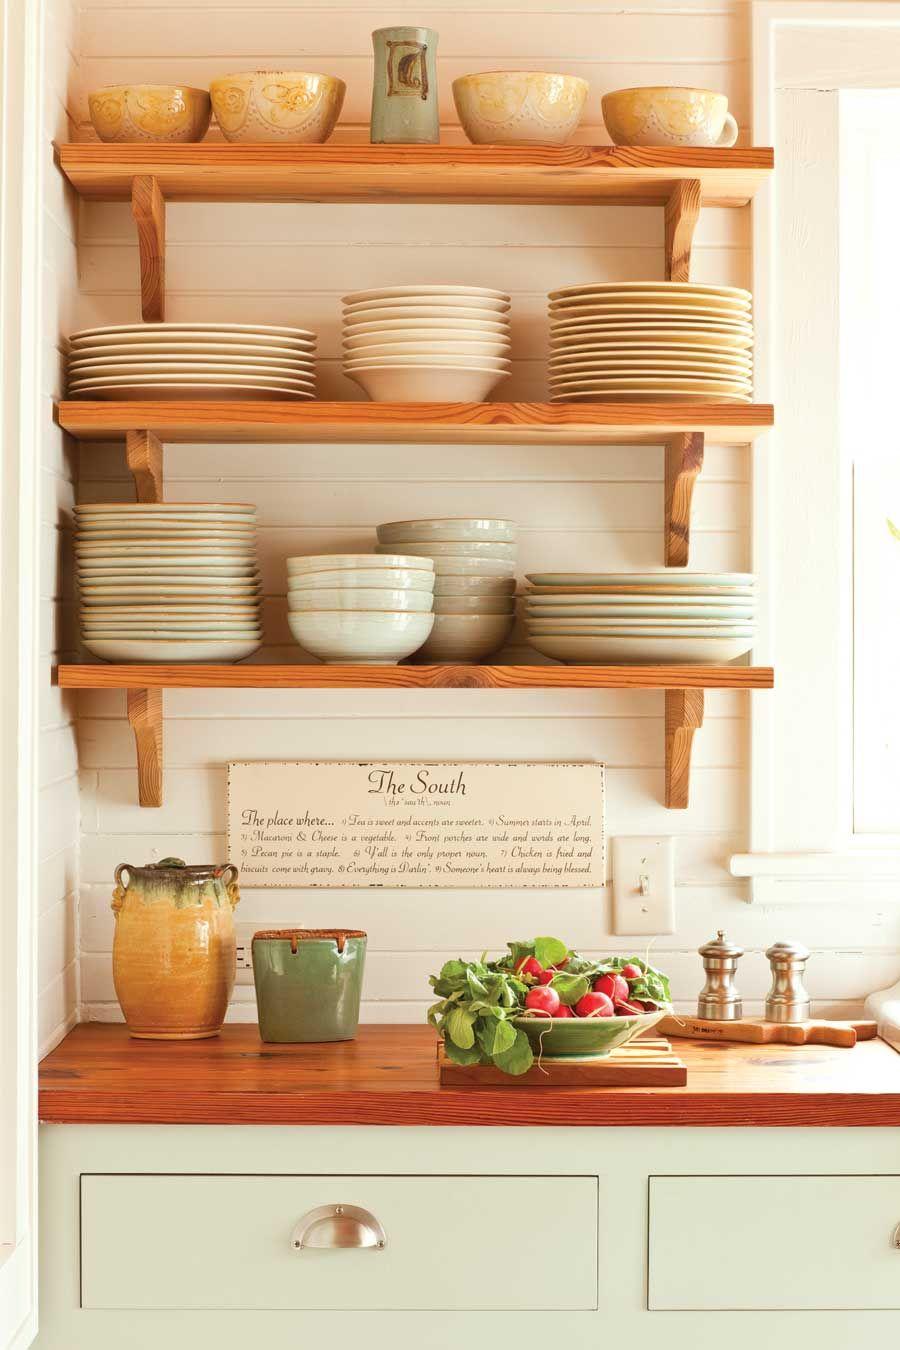 how to create a zero waste kitchen green homes natural home garden natural home decor on zero waste kitchen interior id=31117